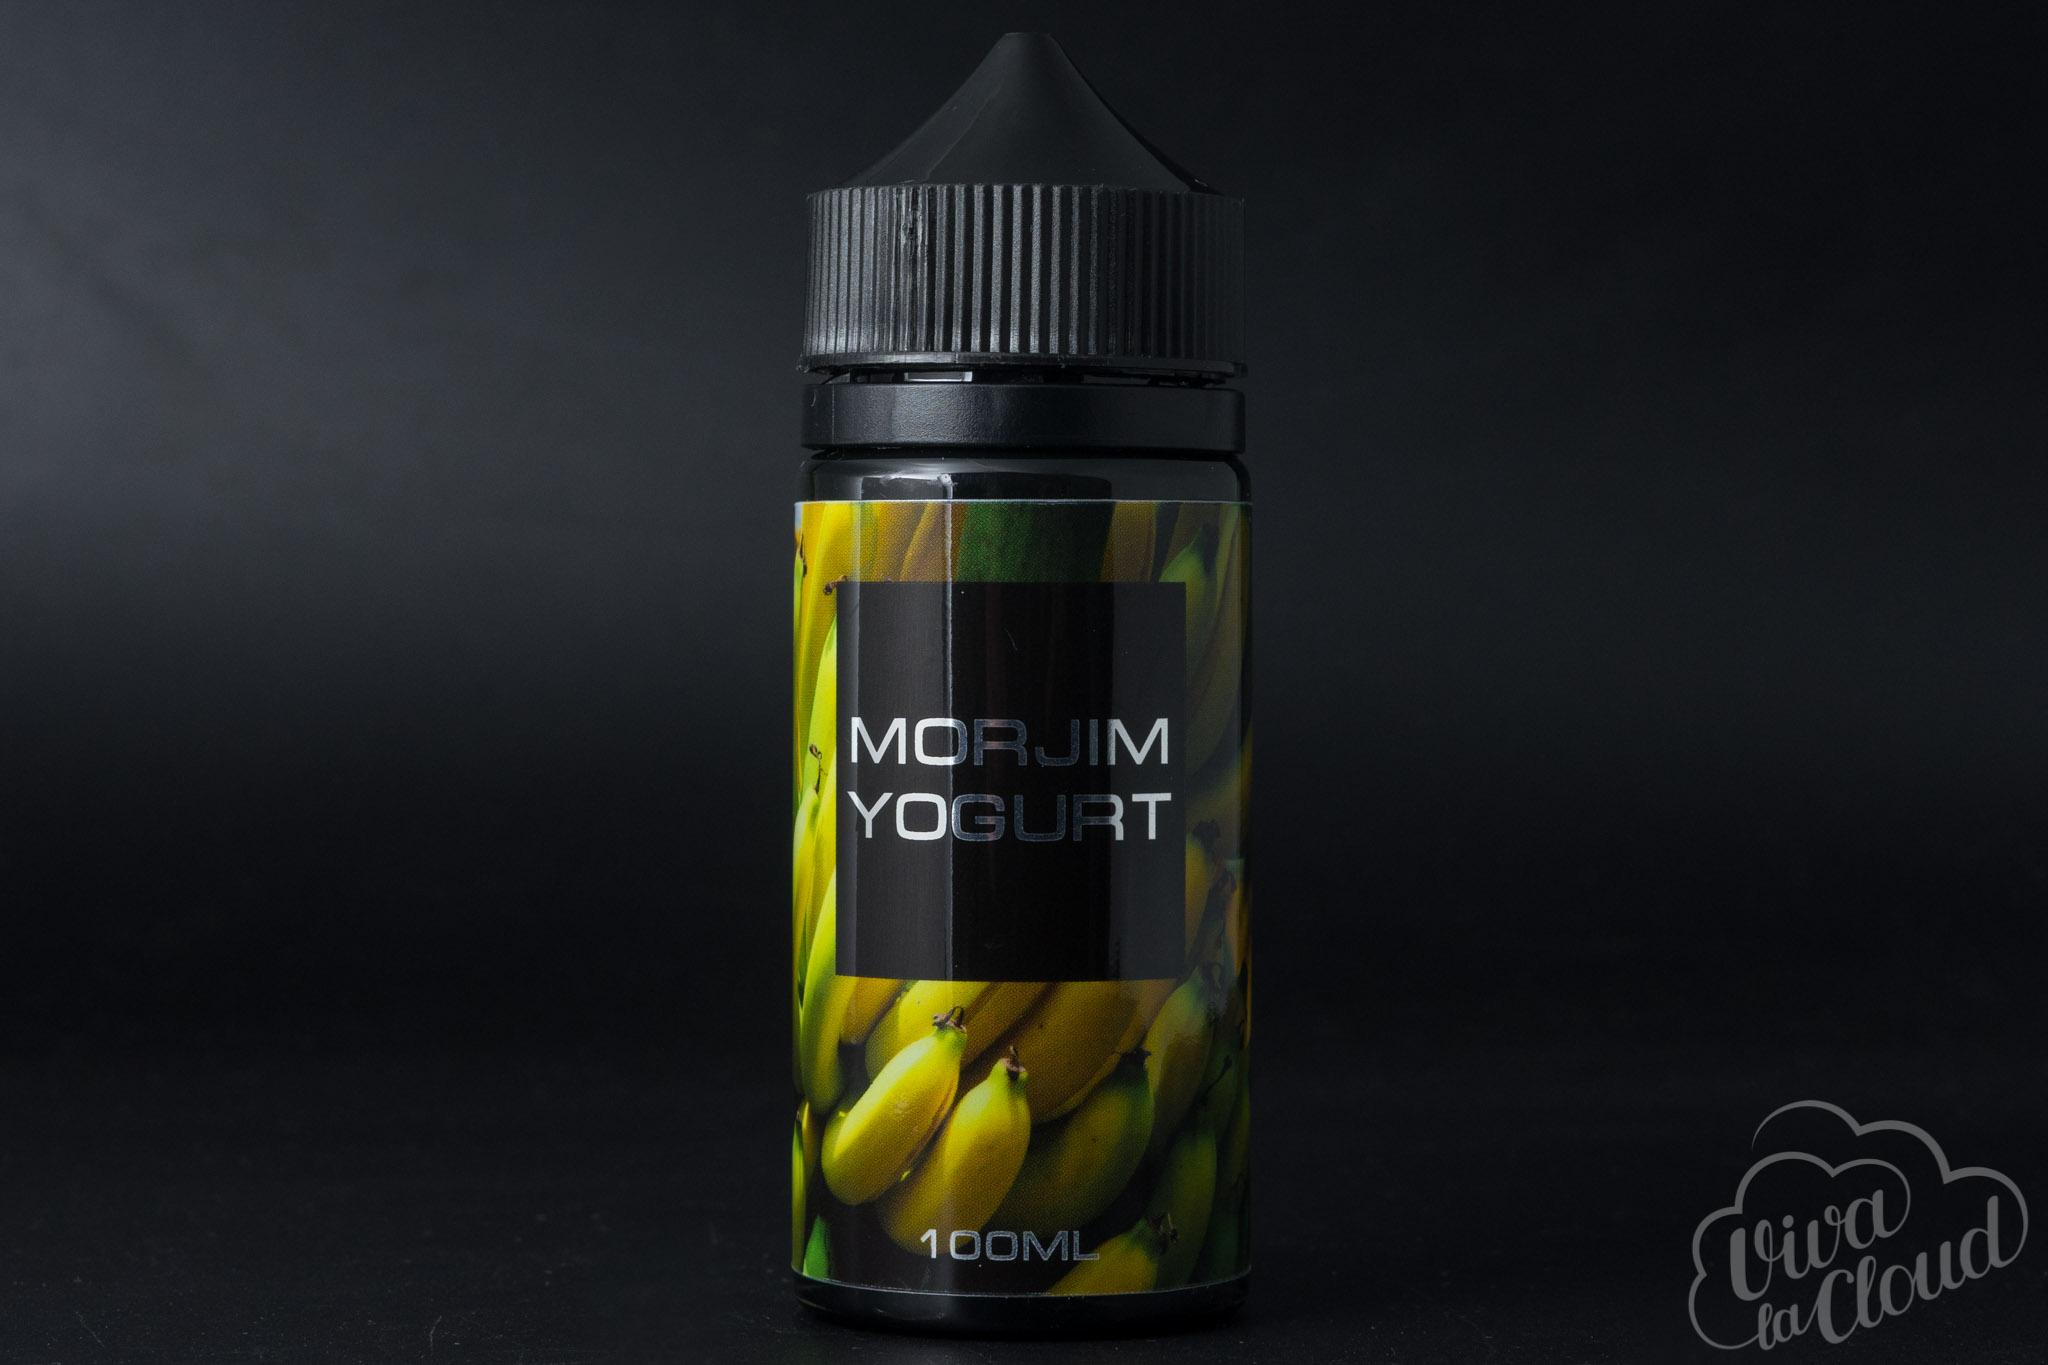 MORJIM YOGURT